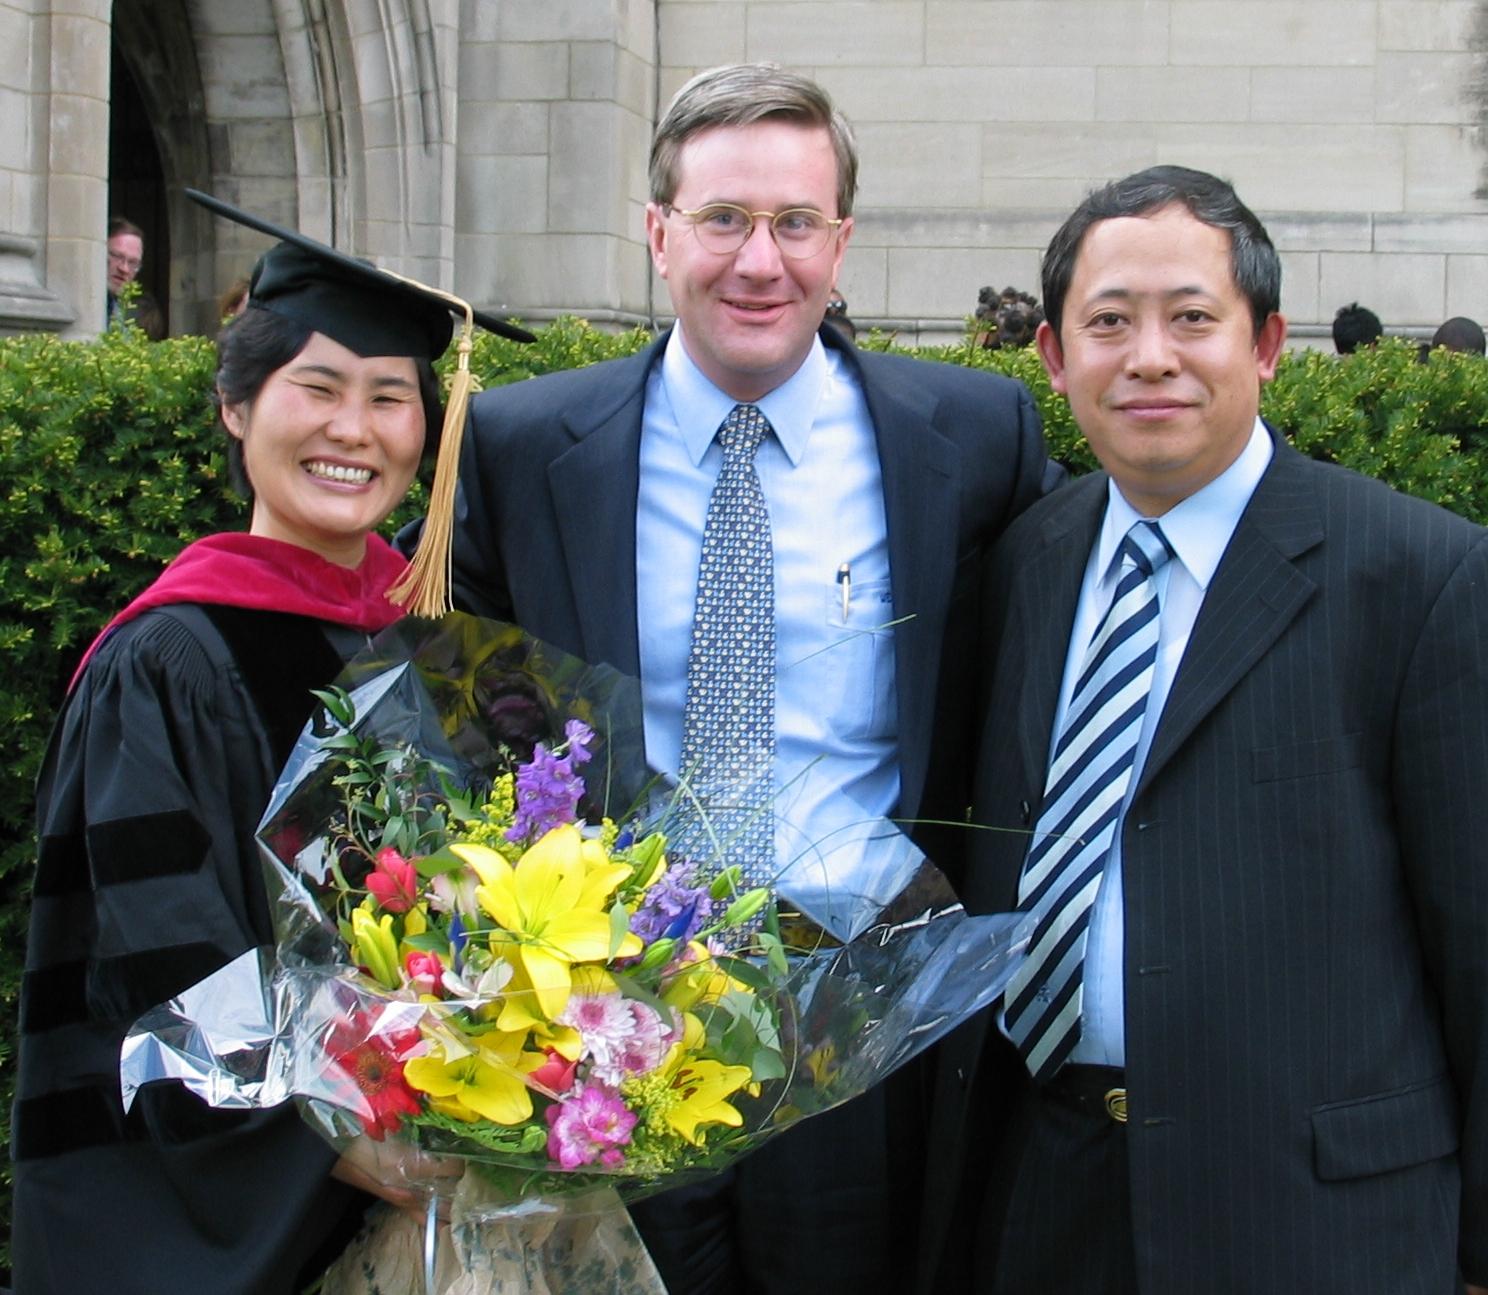 Walter Lewis with Pastor Li Meilan (she) and Pastor Lü De Zhi (he)